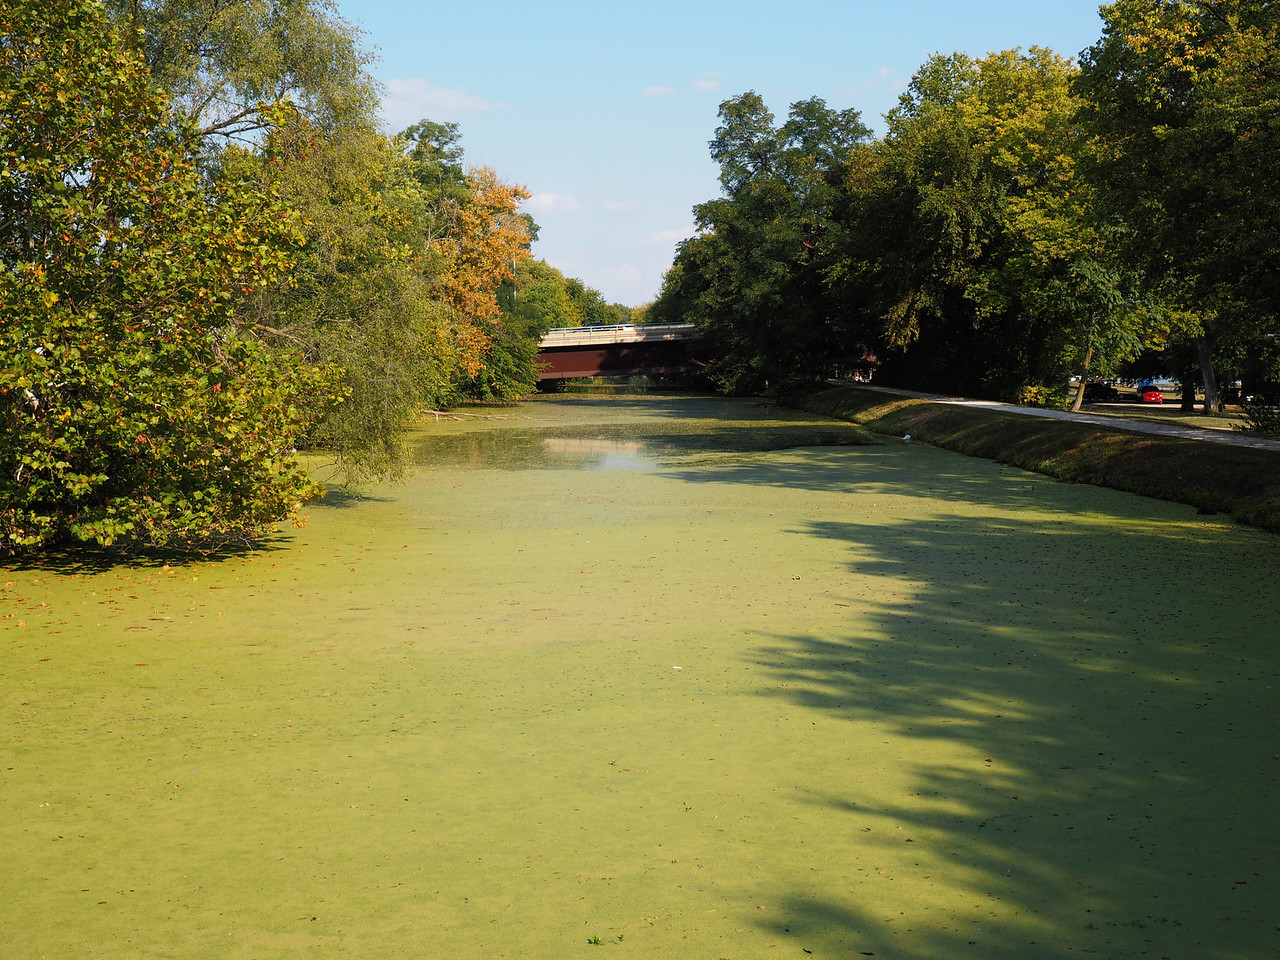 Illinois & Michigan Canal